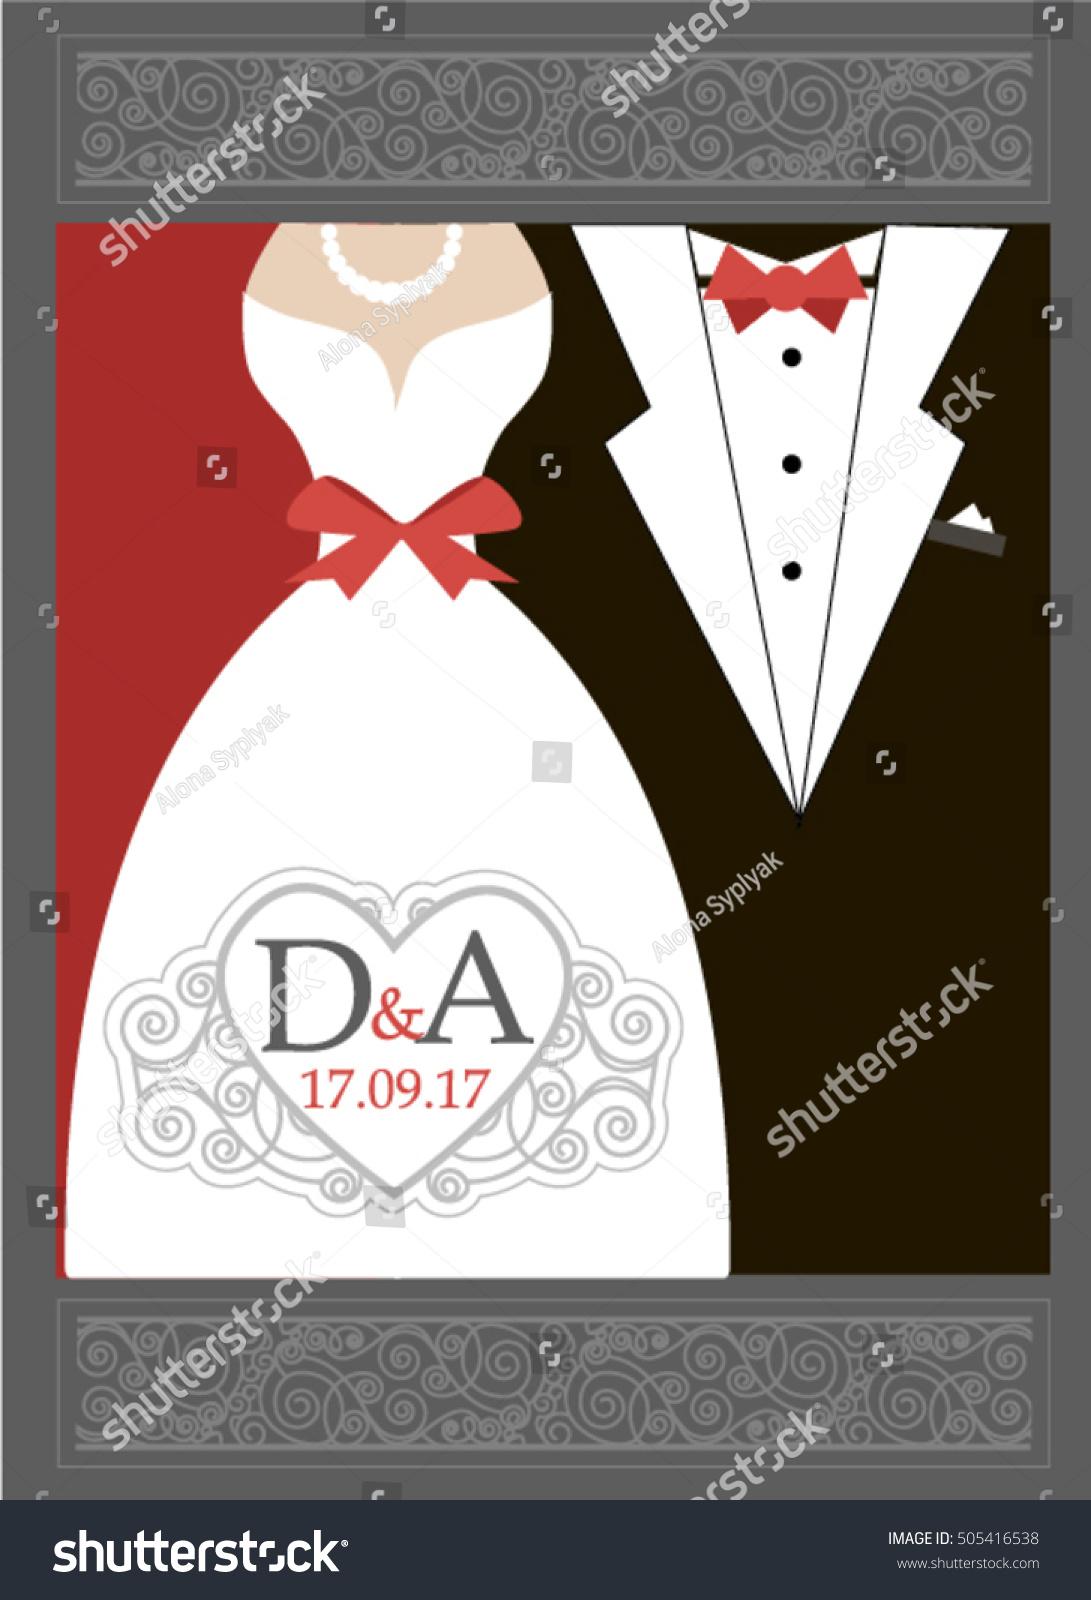 Bride Groom Wedding Invitation Red Black Stock Vector (Royalty Free ...